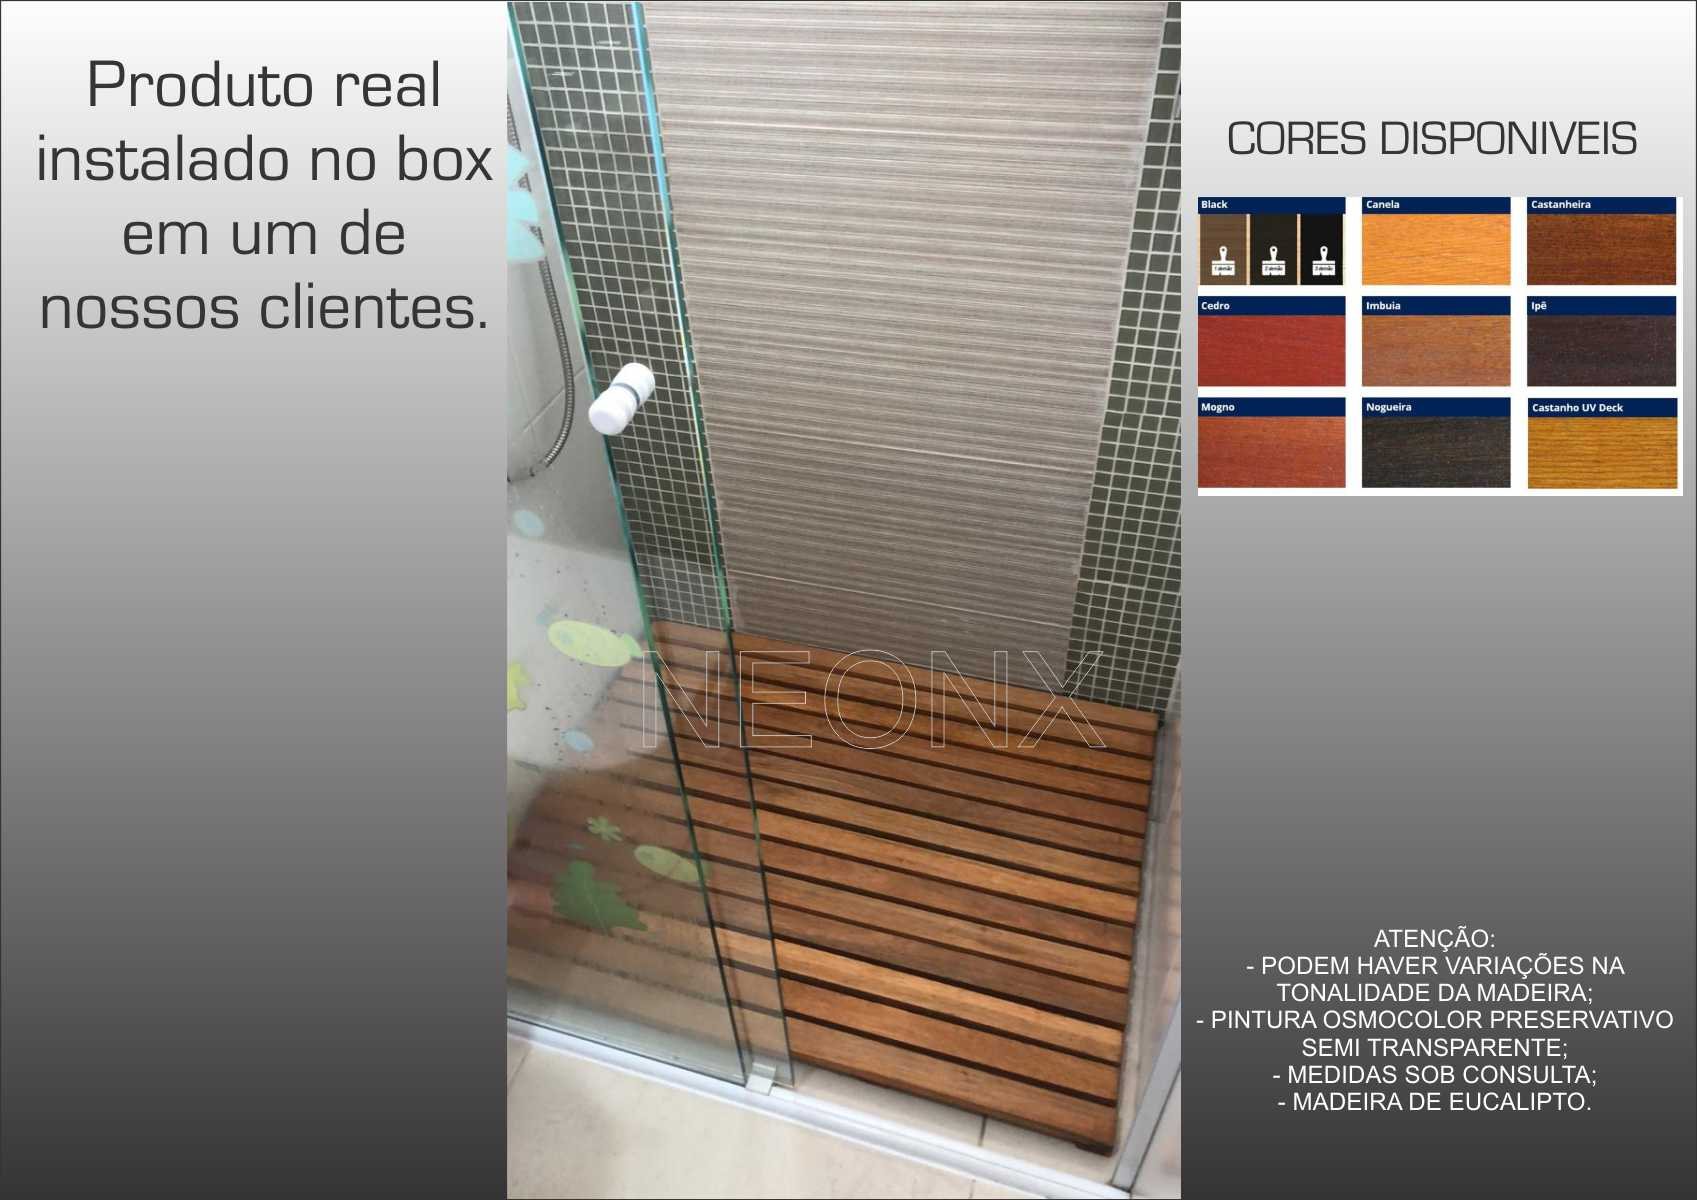 Deck De Madeira Chuveiro Box Banheiro Capacho 100x70 cm Sem Pintura Acabamento Lixado